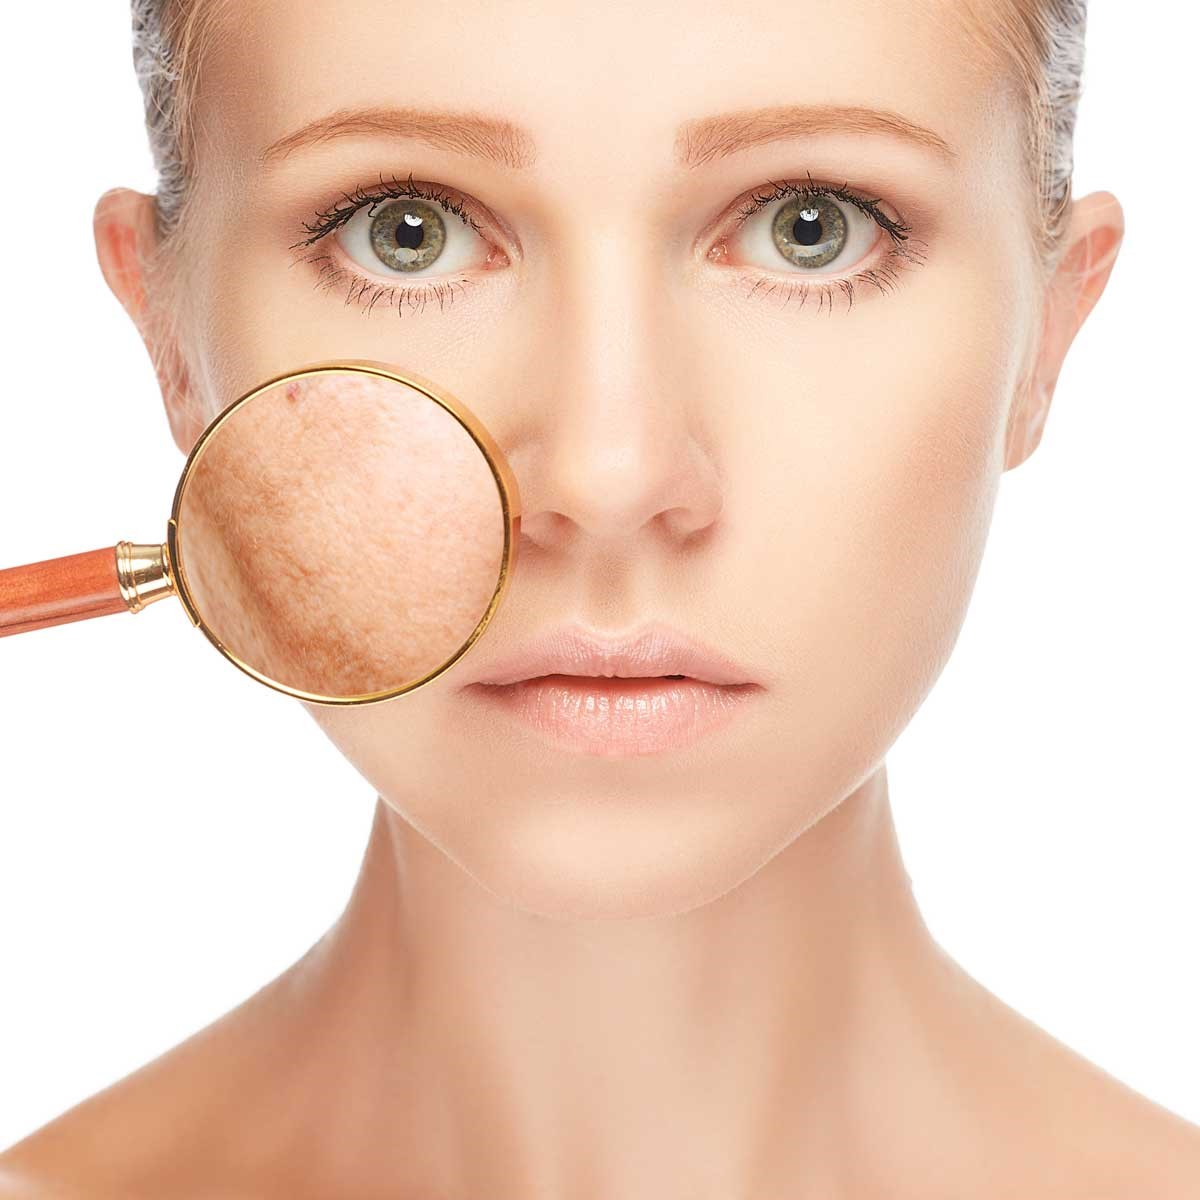 Skin Pigmentation Treatment: Body Aesthetics in Southend-on-Sea ...